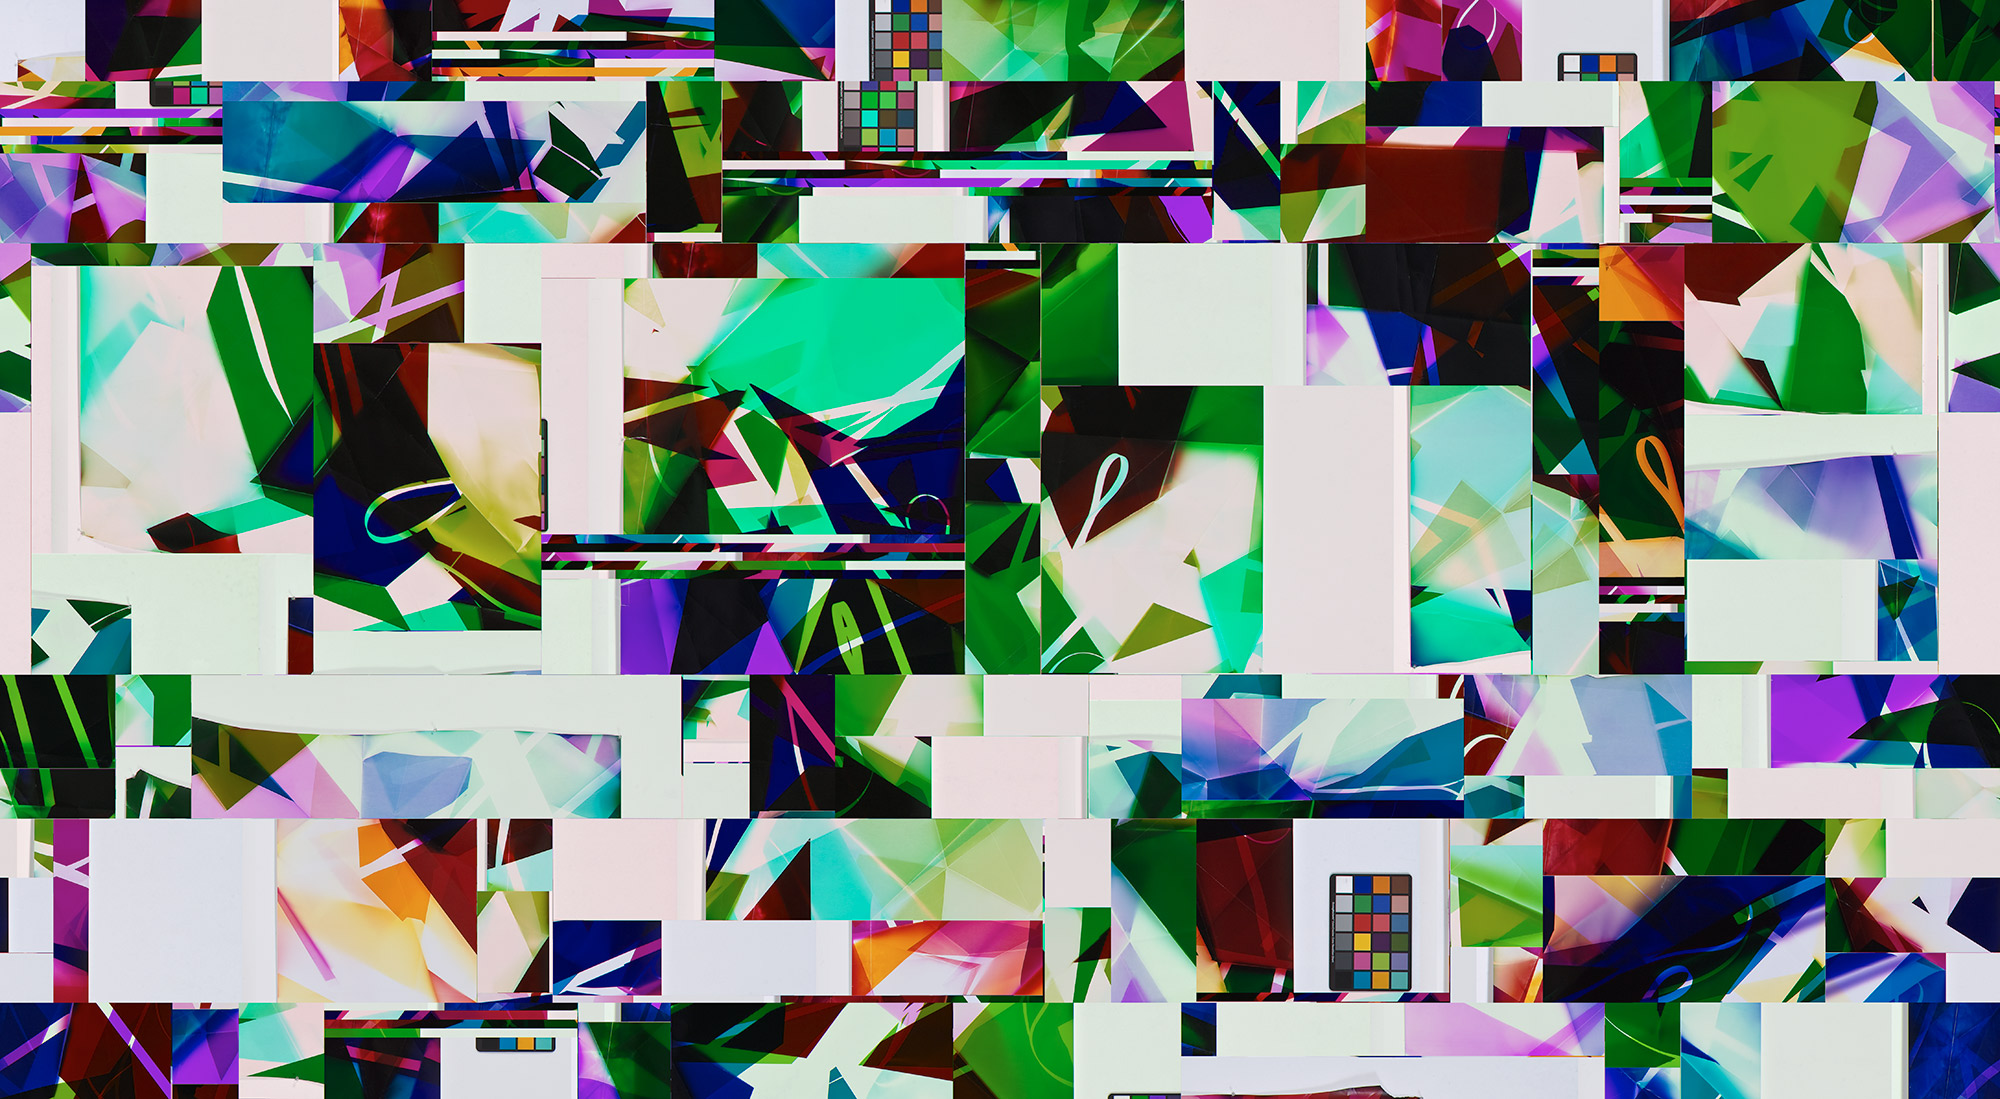 Walead_Beshty_50x109-896in_Supergloss_Lightjet_8inchesWhiteTop&Bottom 1.tif: 26-Feb-2009 6:45 Paper Type:50.0 inch Fuji_FLEX_SuperGLOSSy (w:10000 h: 25179 cr: 0,0,10000,25179 N 134), Walead_Beshty_50x109-896in_Supergloss_Lightjet_8inchesWhiteTop&Bottom 2.tif: 26-Feb-2009 9:04 Paper Type: 50.0 inch Fuji_FLEX_SuperGLOSSy (w:10000 h: 25179 cr:0,0,10000,25179 N 134), Walead_Beshty_50x109-896in_Supergloss_Lightjet_8inchesWhiteTop&Bottom 3.tif: 26-Feb-2009 6:45 Paper Type: 50.0 inch Fuji_FLEX_SuperGLOSSy (w:10000 h: 25179 cr: 0,0,10000,25179 N 134), Walead_Beshty_50x109-896in_Supergloss_Lightjet_8inchesWhiteTop&Bottom 4.tif: 26-Feb-2009 8:50 Paper Type: 50.0 inch Fuji_FLEX_SuperGLOSSy (w:10000 h: 25179 cr: 0,0,10000,25179 N 134) [20090113_cao_beshty_025b.tif, Six Color Loop (CMYRGB: Irvine, California, July 16th 2008, Fuji Crystal Archive Type C), 20090113_cao_beshty_026b.tif, Six Color Loop (CMYRGB: Irvine, California, July 26th 2008, Fuji Crystal Archive Type C),20090113_cao_beshty_027b.tif, Six Color Loop (CMYRGB: Irvine, California, July 18th 2008, Fuji Crystal Archive Type C)], 2009, digital image file     2009   Fuji Flex Super Gloss lightjet prints  133 15/16 x 200 inches each, 6 parts